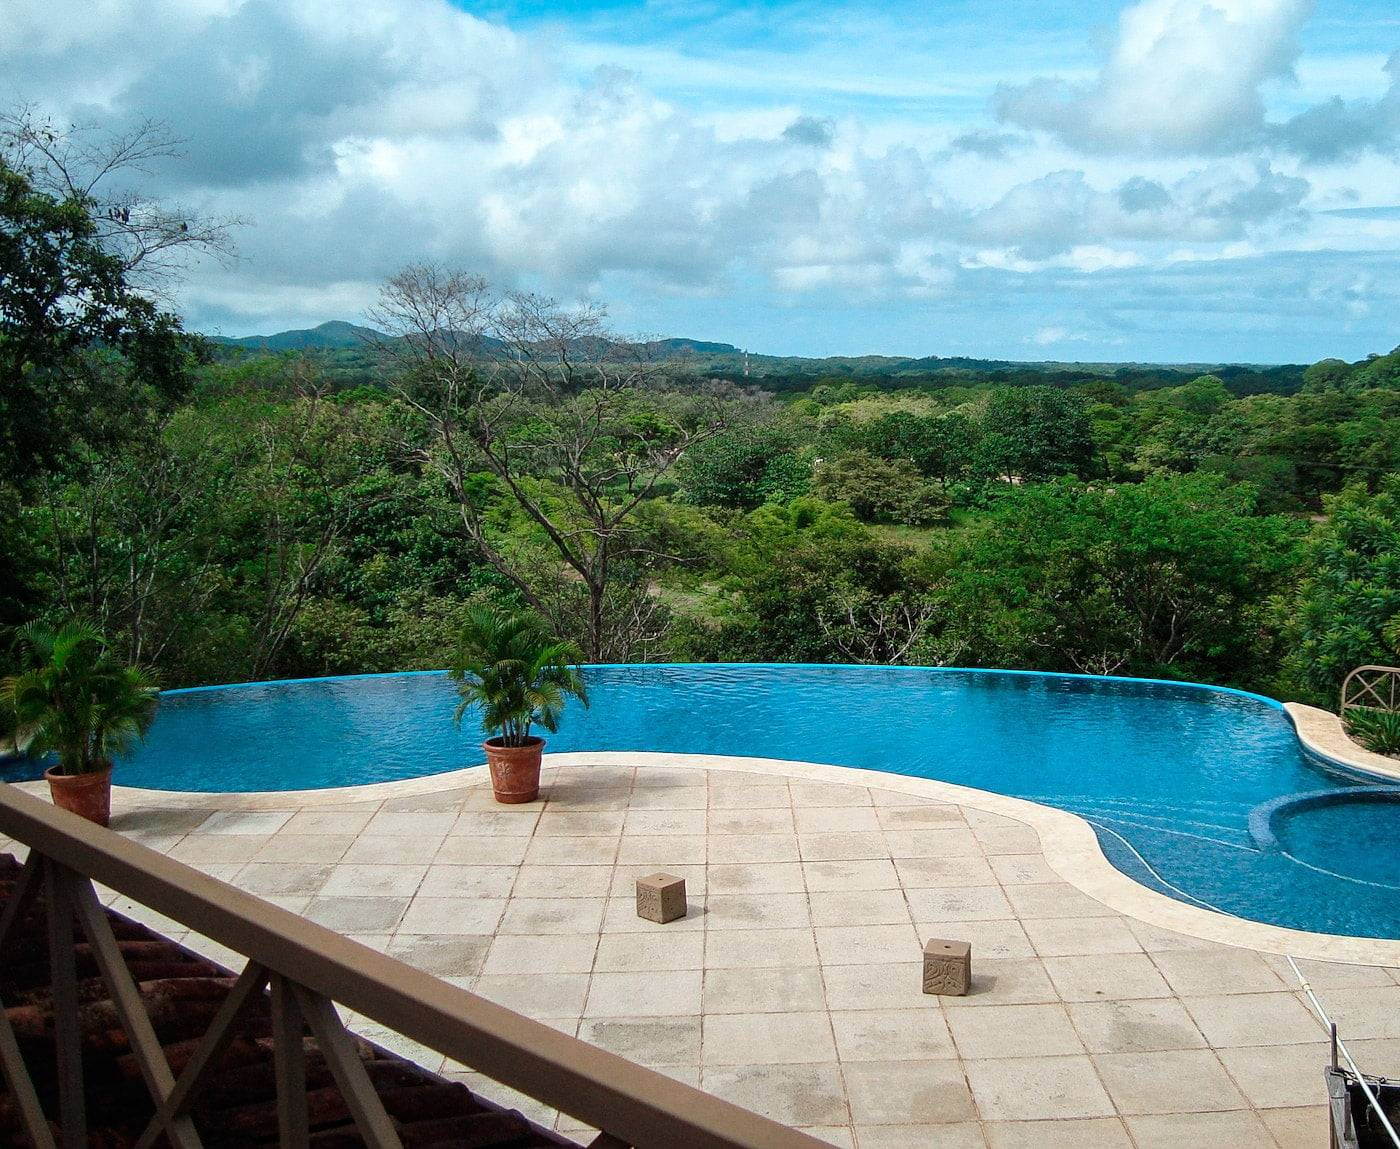 Rancho Villareal gated community near Tamarindo Costa Rica